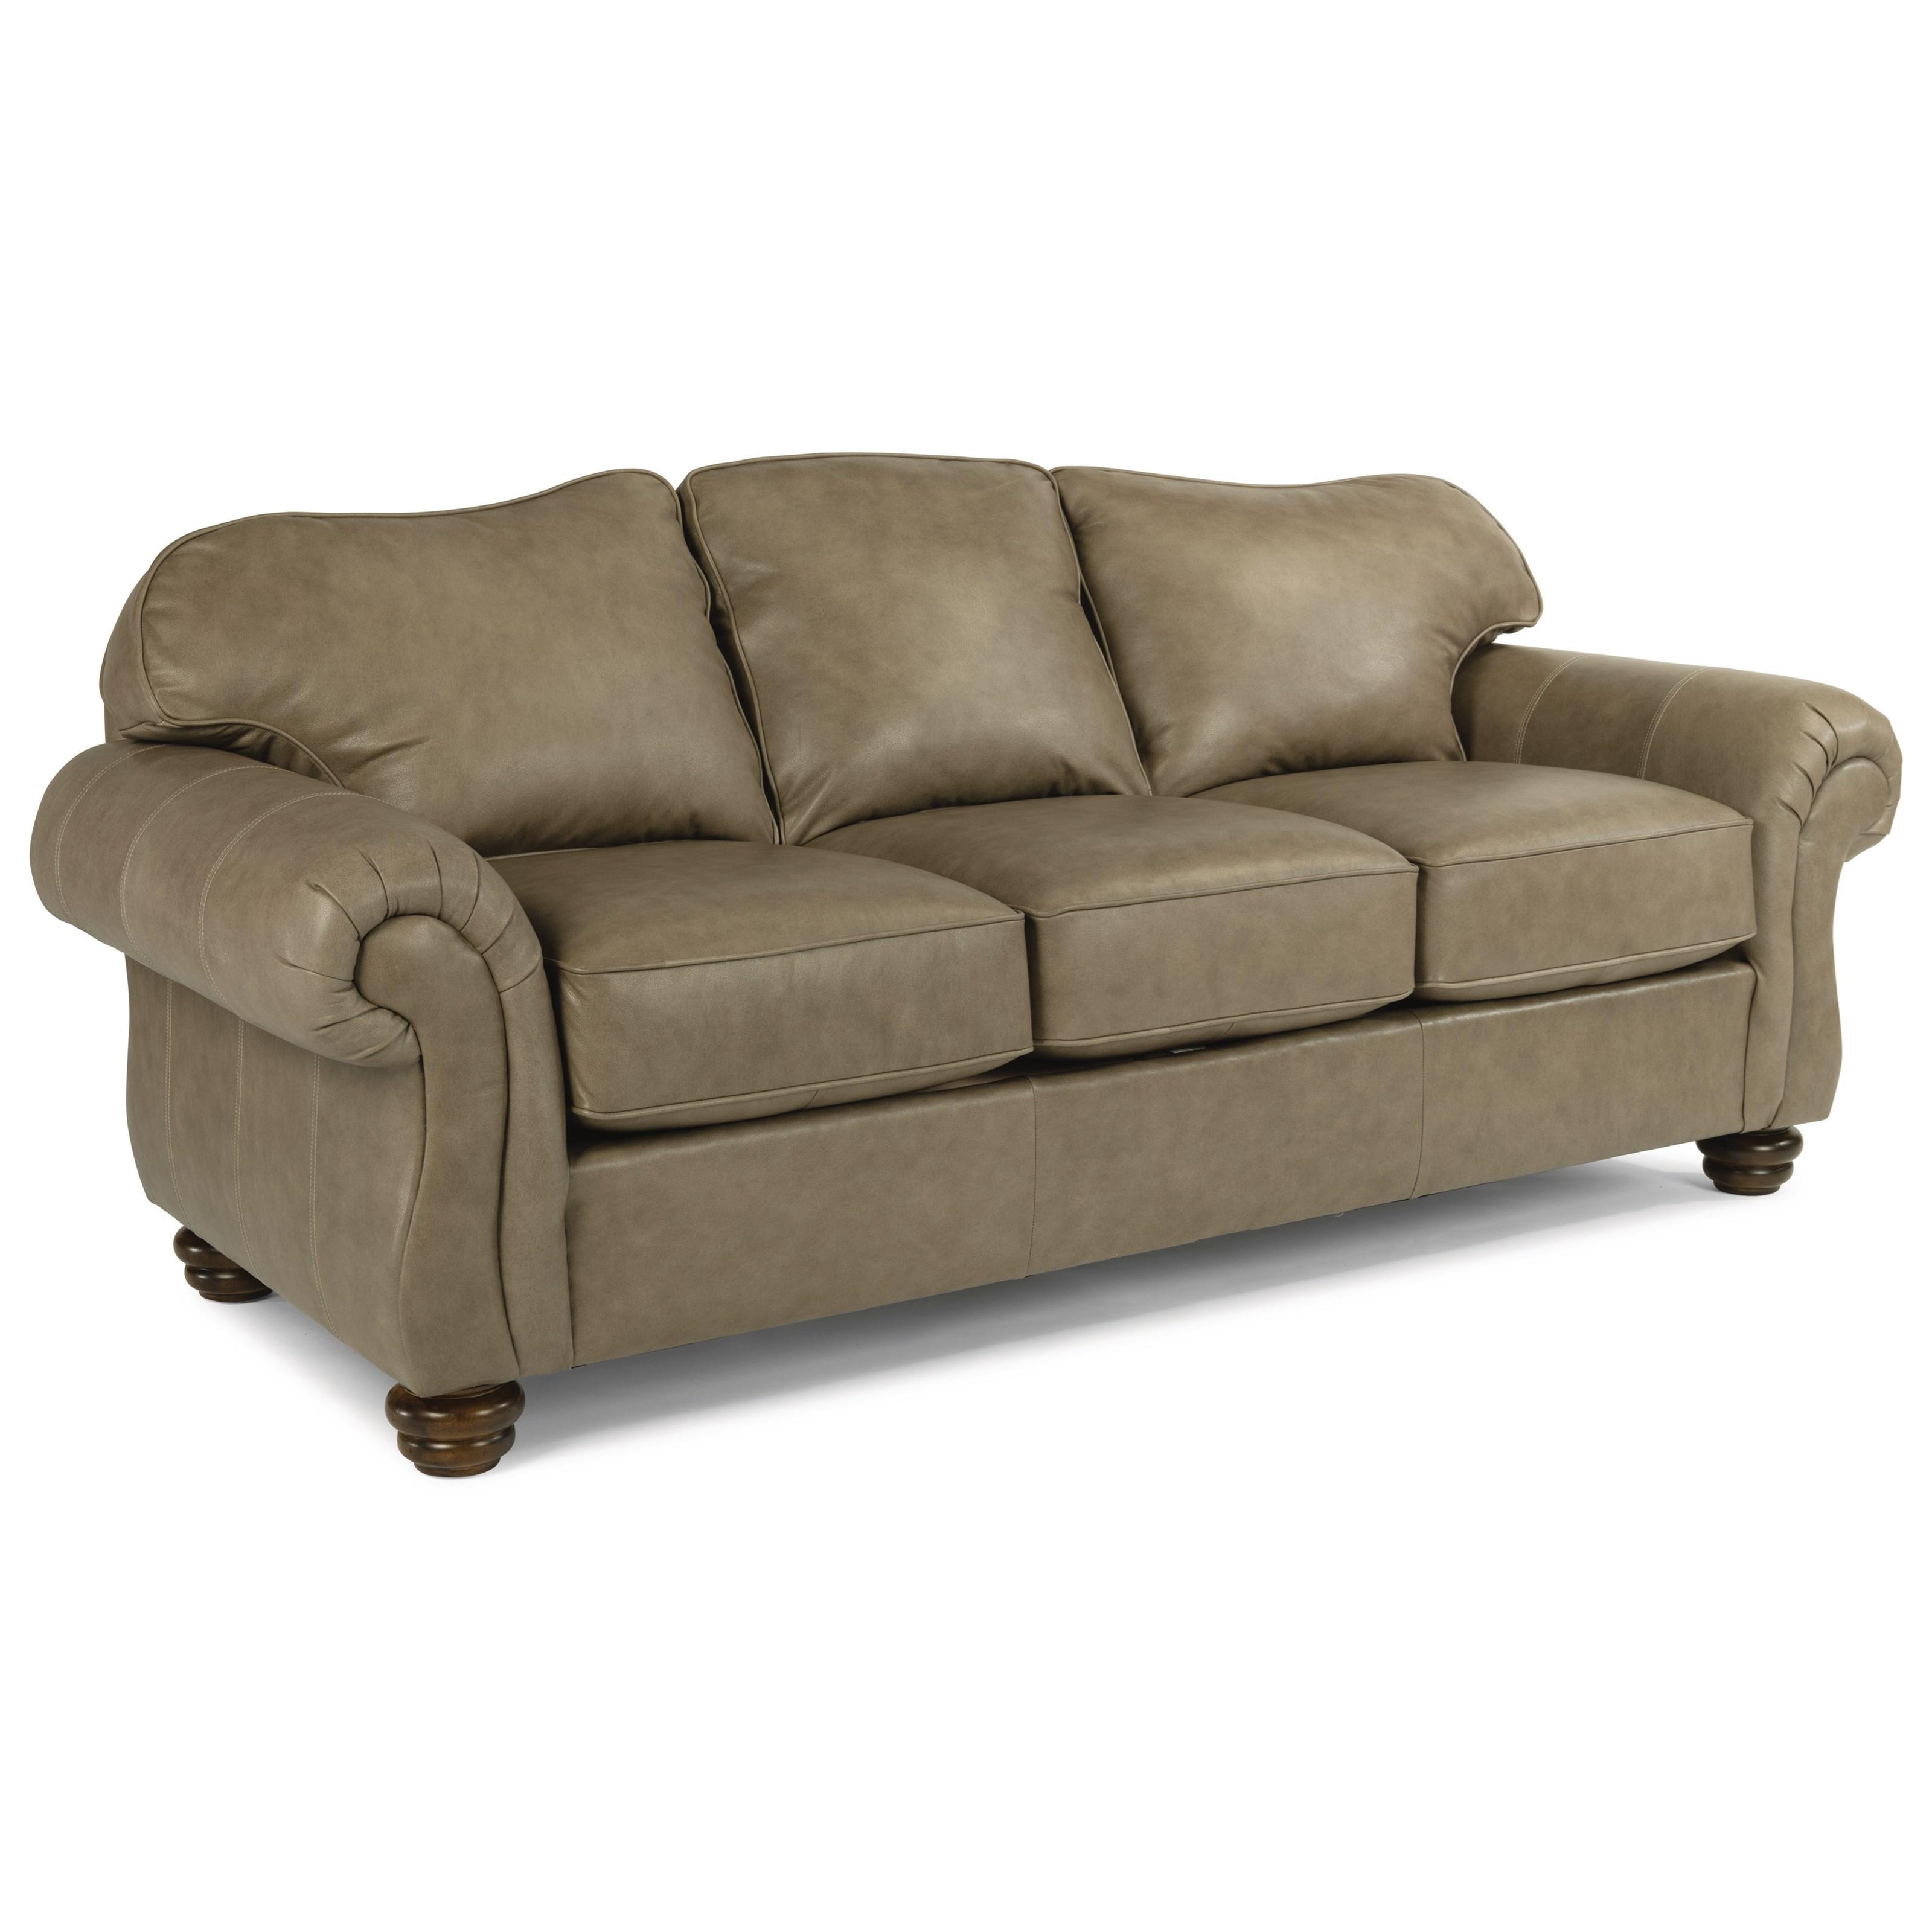 Bexley Sofa  by Flexsteel at Jordan's Home Furnishings